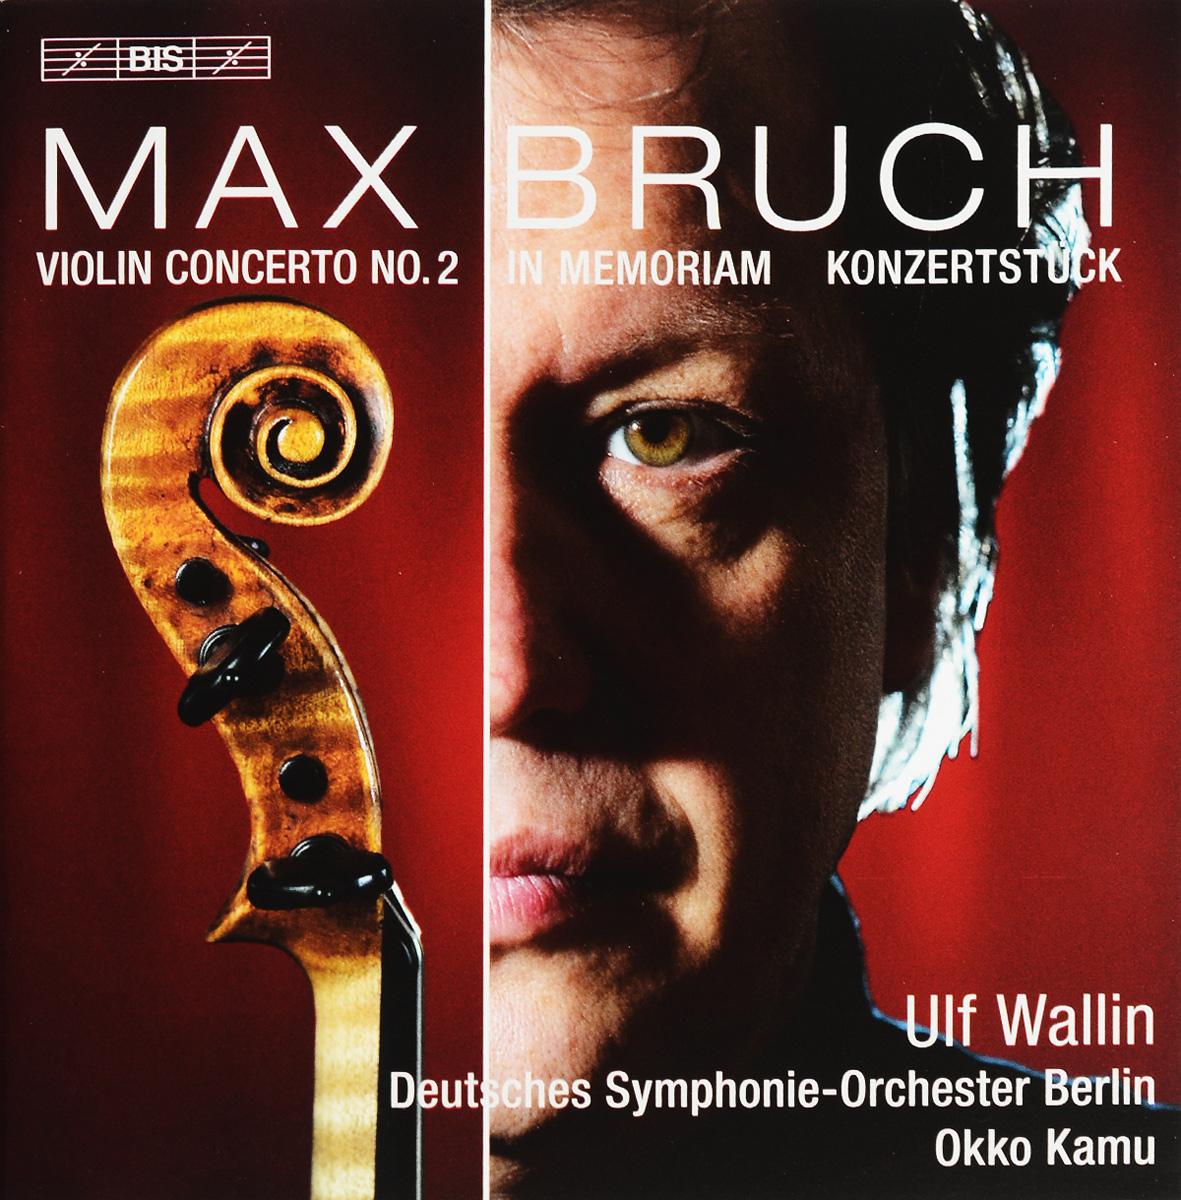 Воллин Ульф,Deutsches Symphonie-Orchester Berlin,Окко Каму Ulf Wallin, Deutsches Symphonie-Orchester Berlin, Okko Kamu. Max Bruch. Violin Concerto No. 2 (SACD)